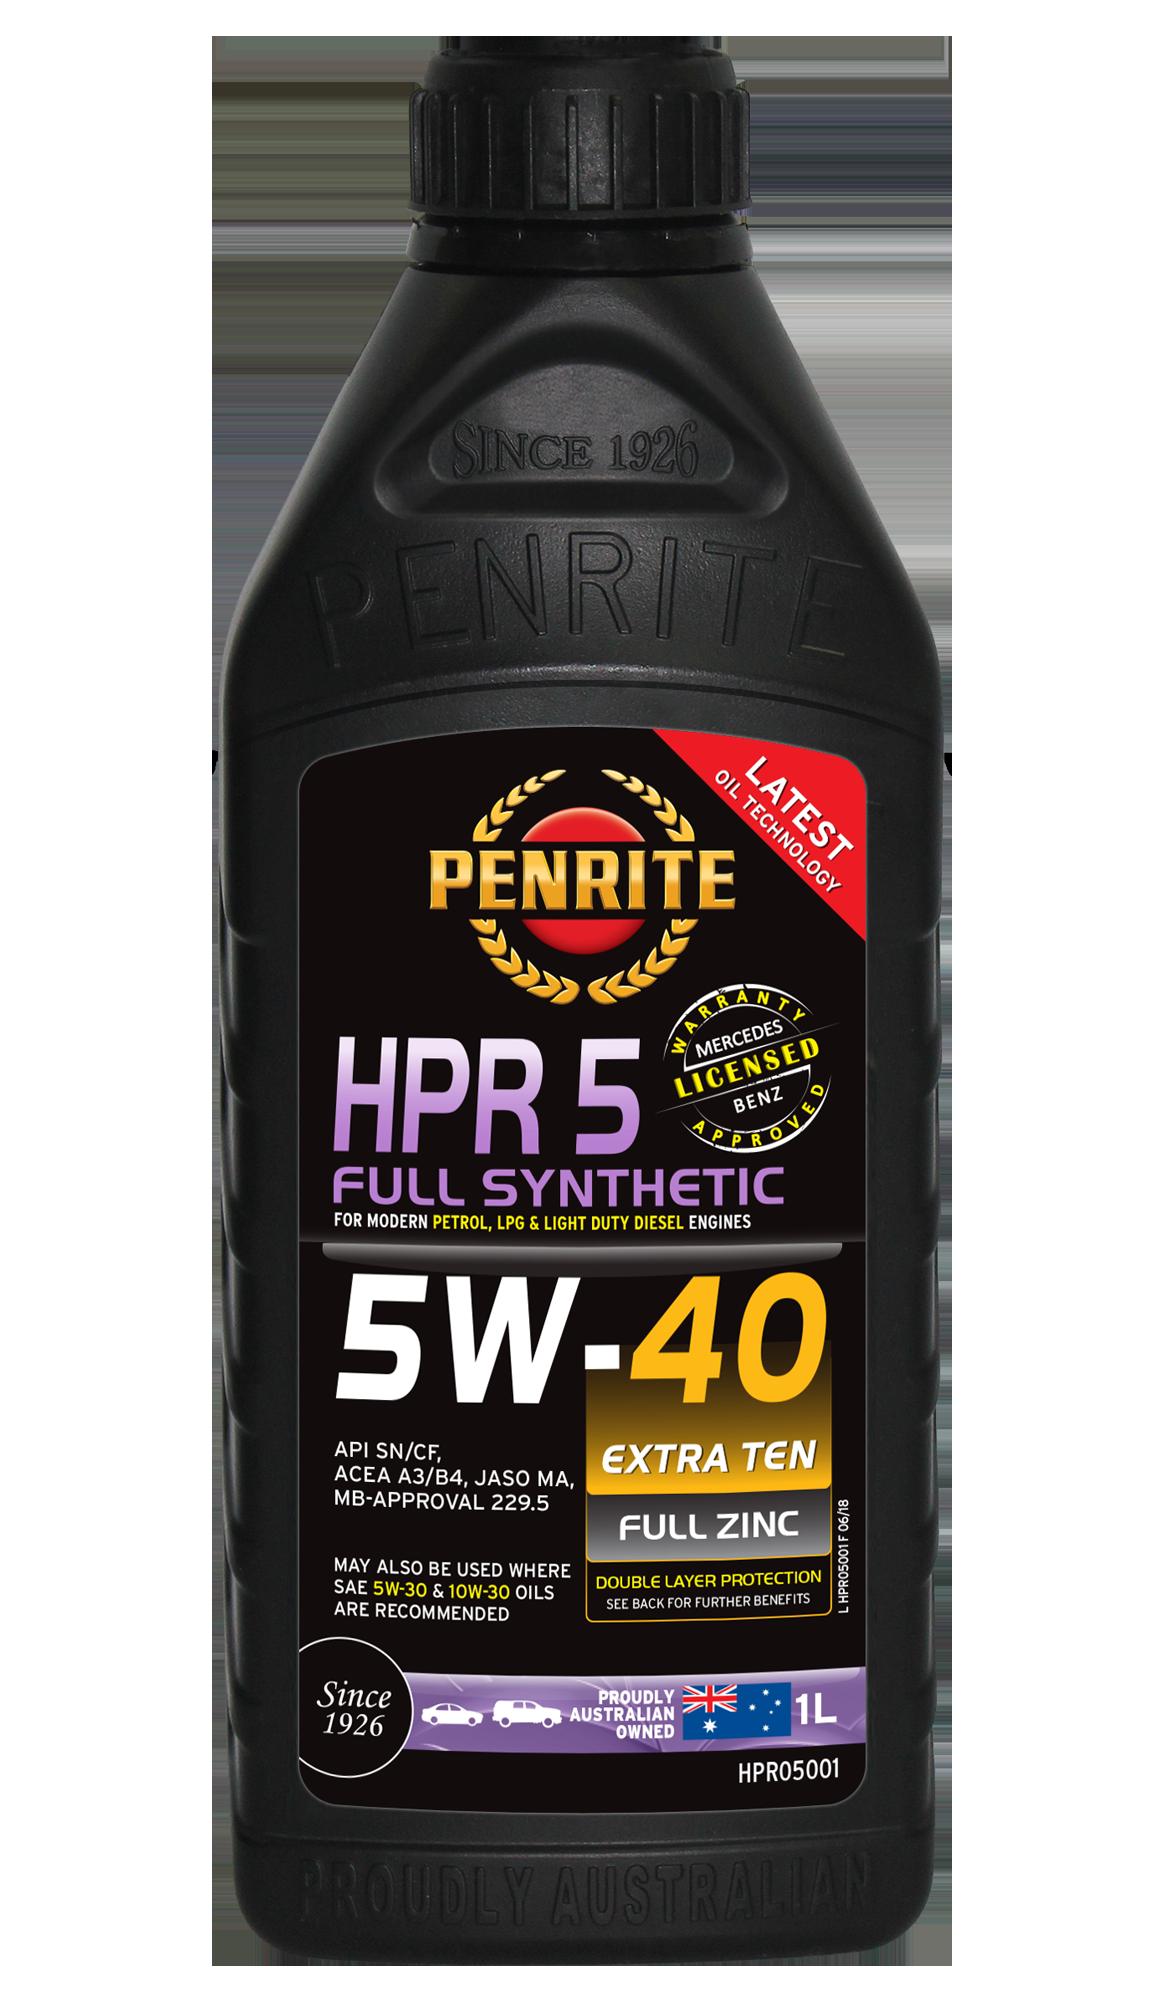 PENRITE HPR 5 5W-40 1L